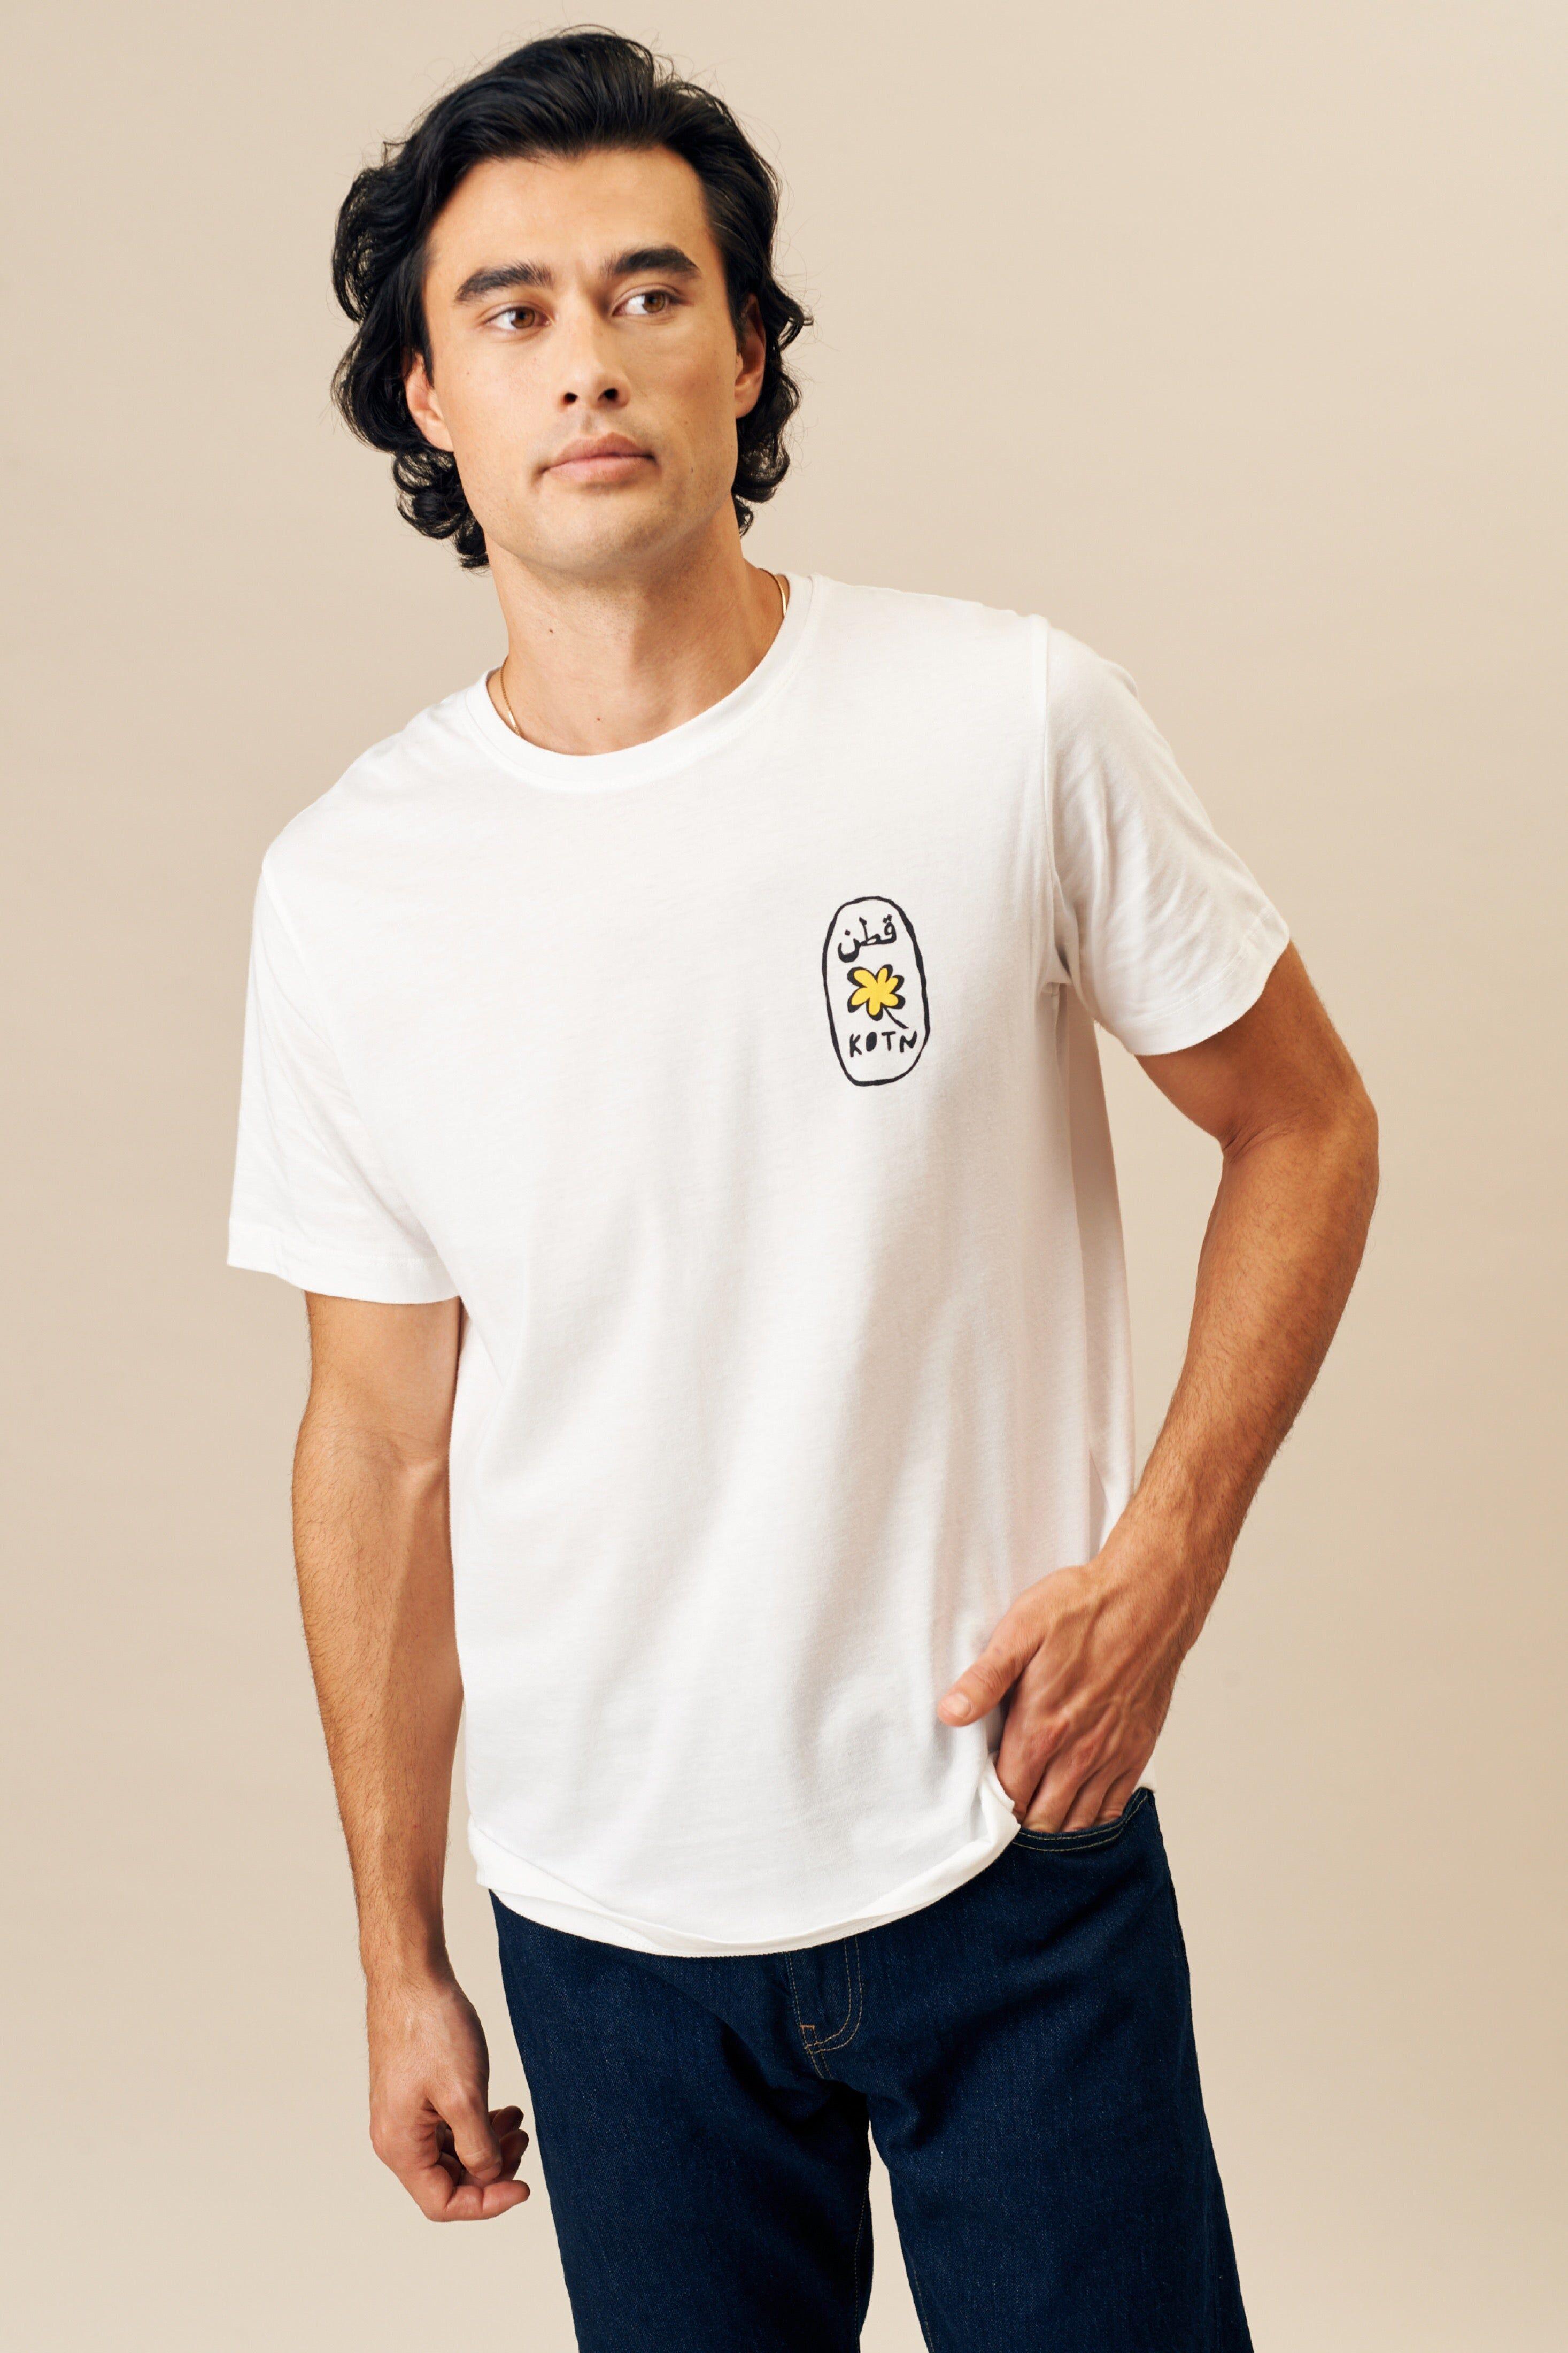 Kotn Unisex Cartouche Crew T-Shirt in White, Size Large, 100% Egyptian Cotton